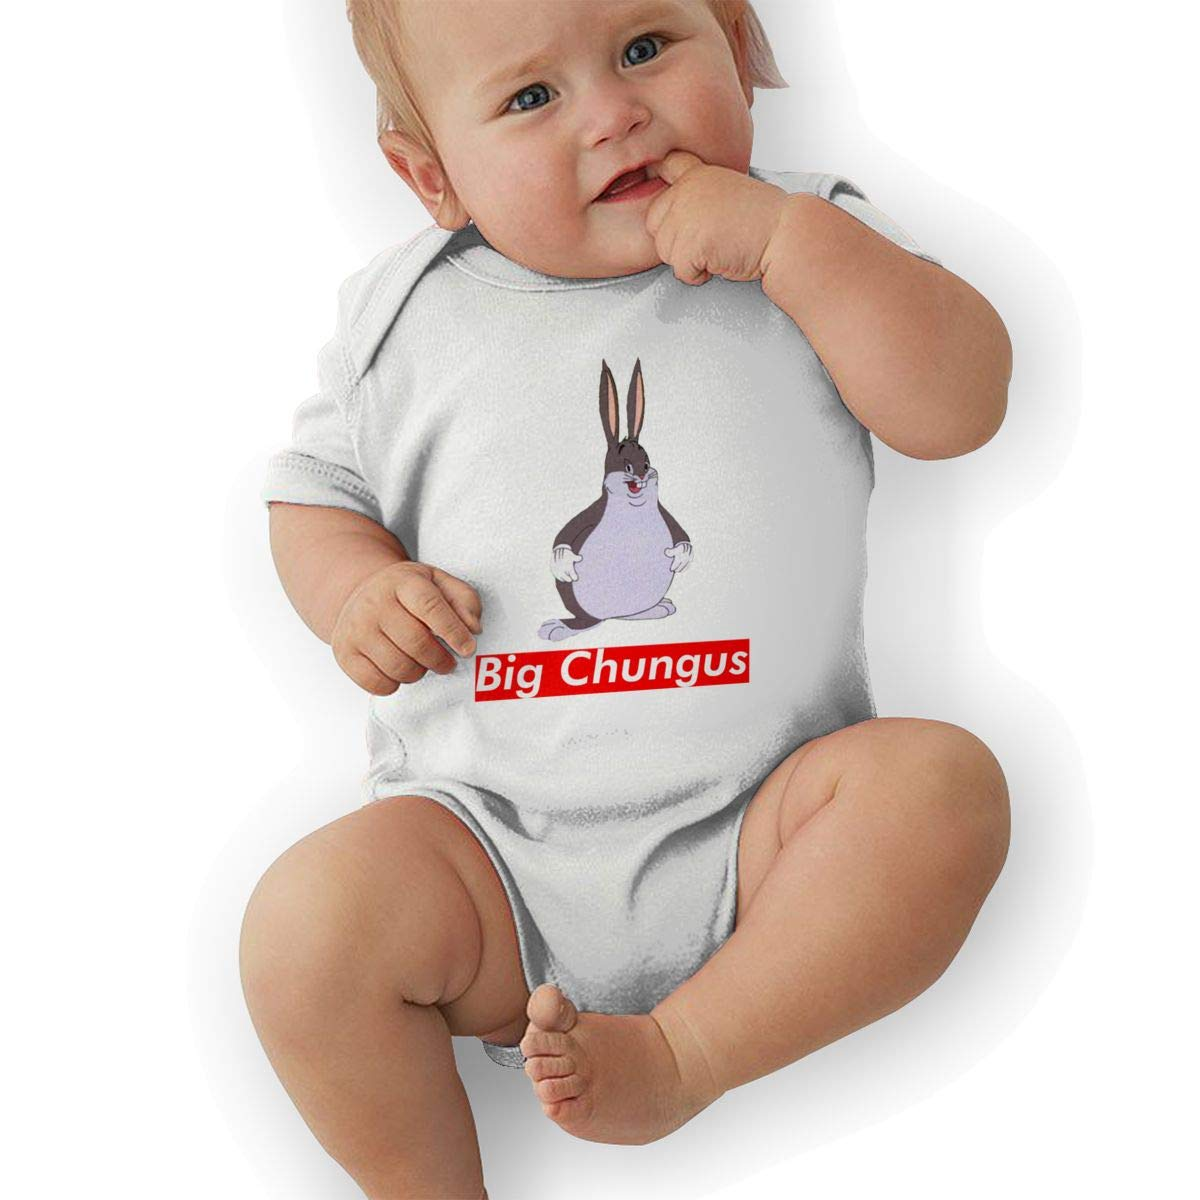 Amazon Com Dgge Big Chungus Supreme Baby Romper Baby Boy And Baby